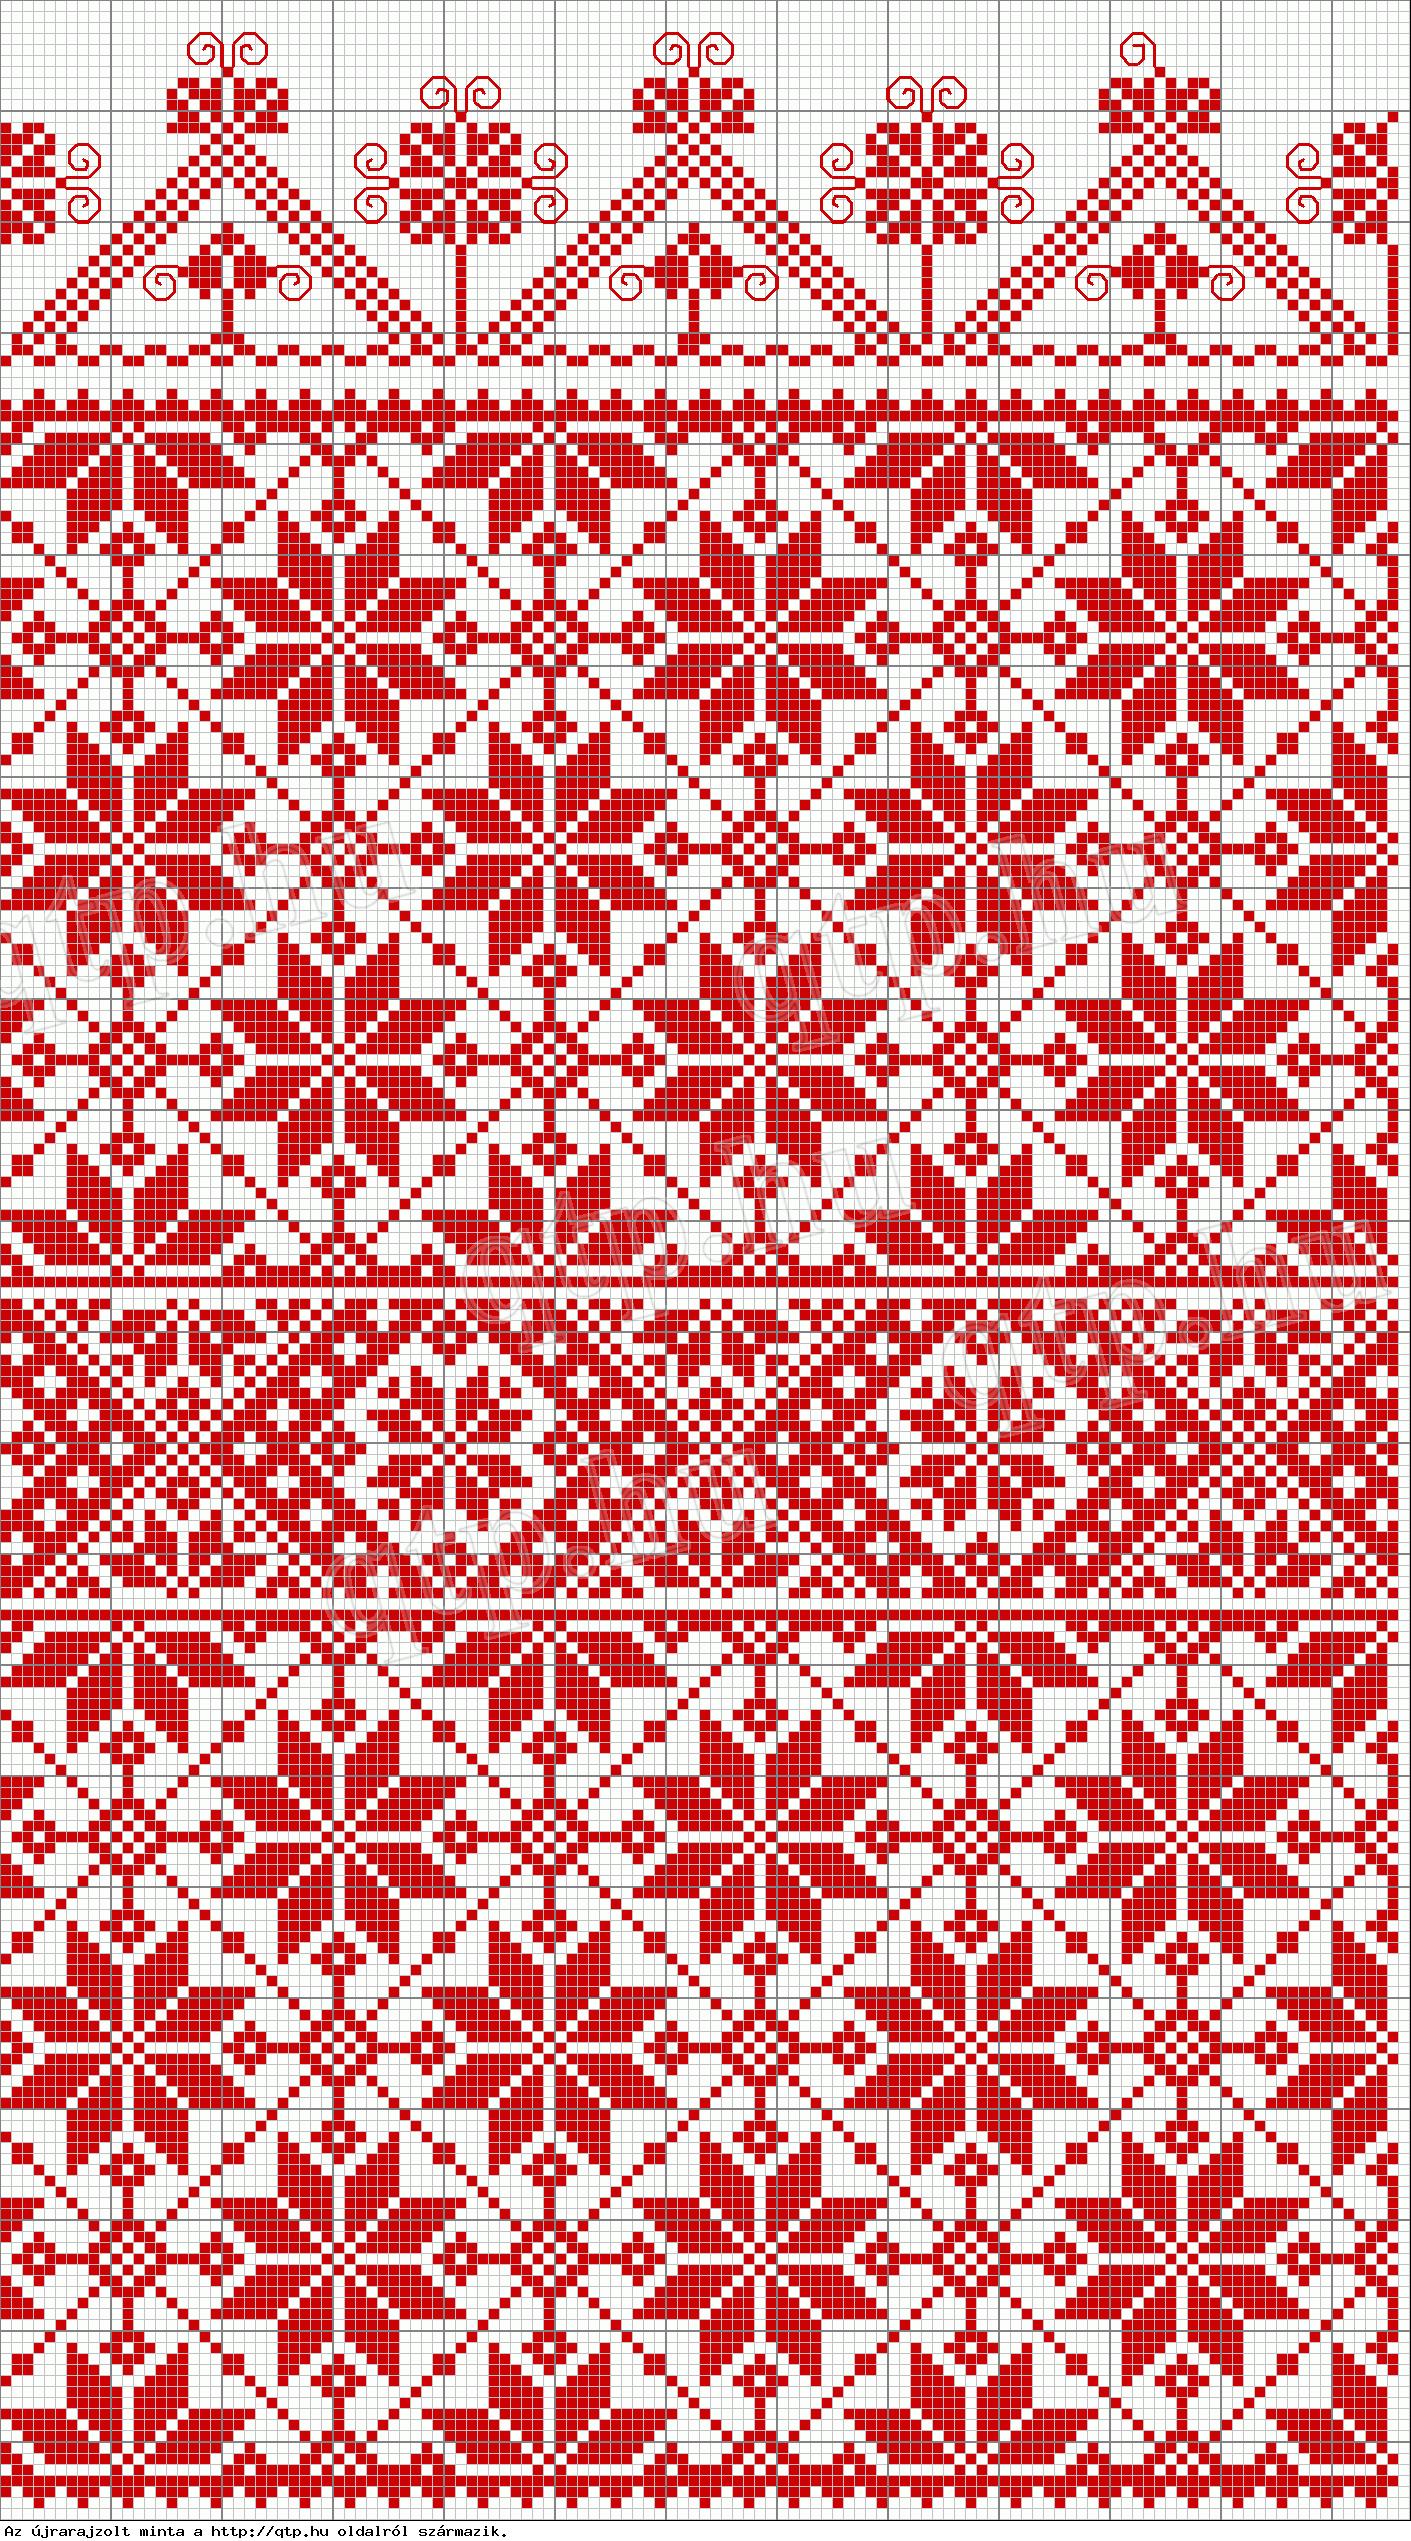 Free Fair Isle Knitting Patterns Choice Image - handicraft ideas ...